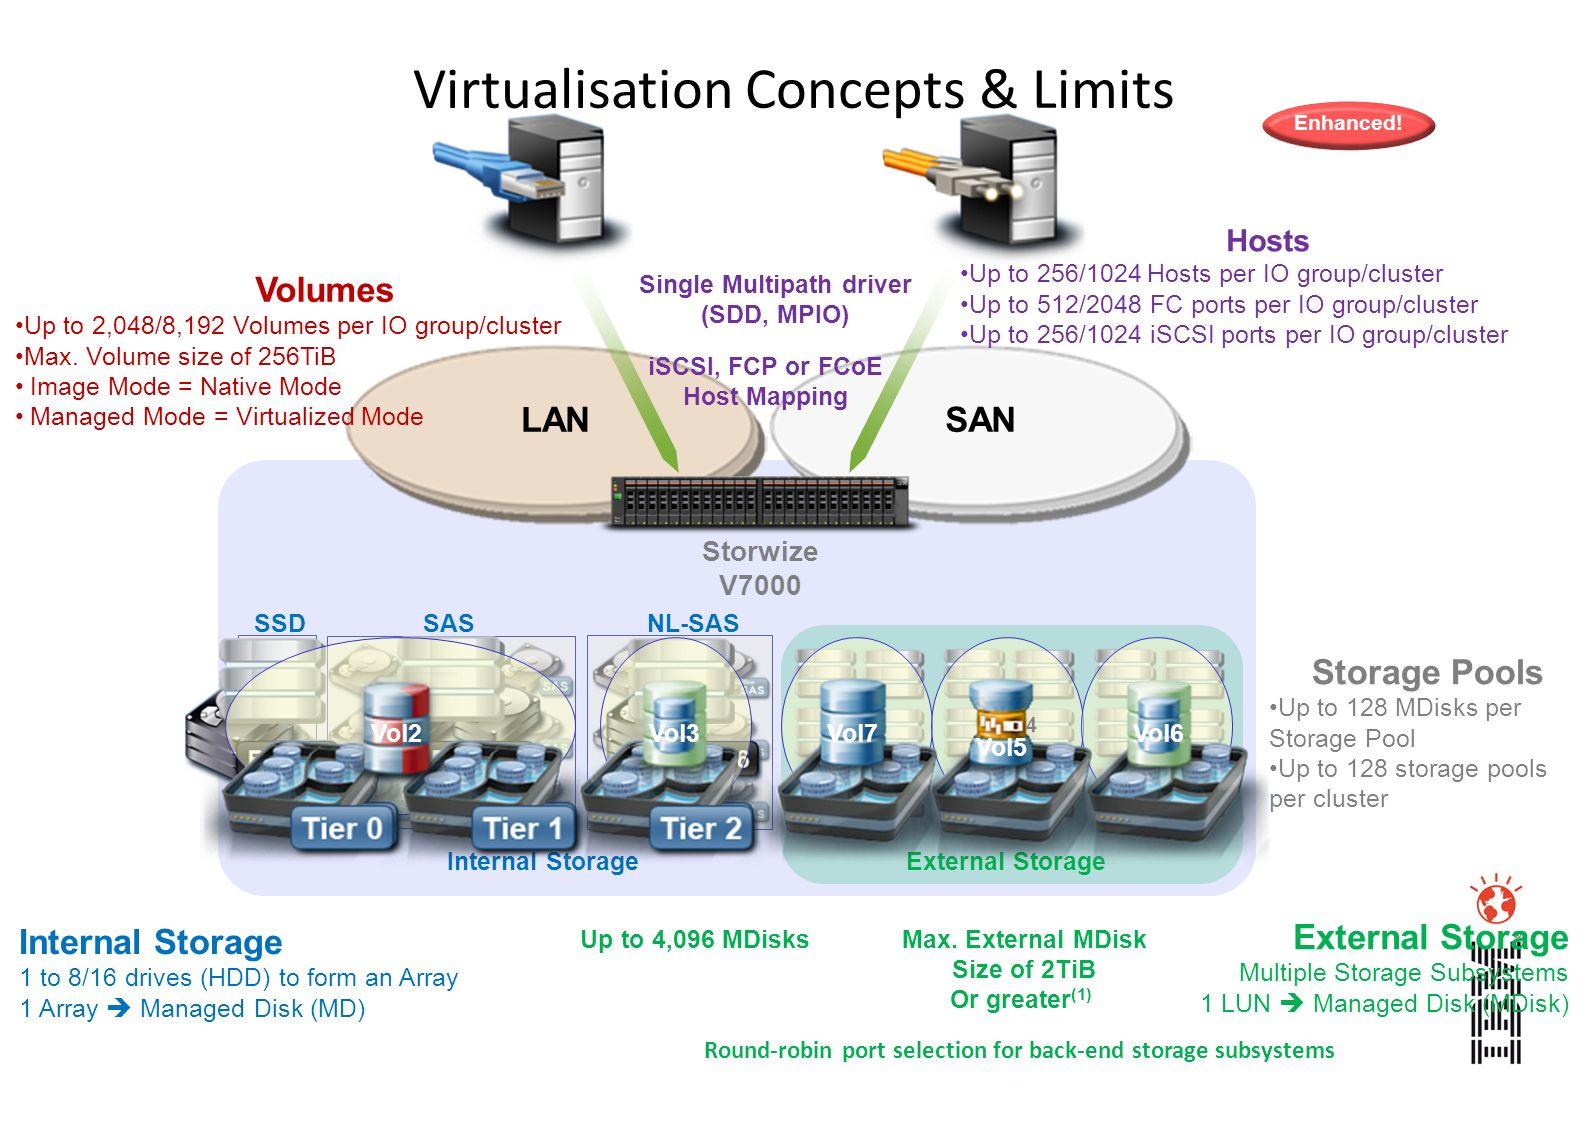 LAN Volumes Up to 2,048/8,192 Volumes per IO group/cluster Max. Volume size of 256TiB Image Mode = Native Mode Managed Mode = Virtualized Mode Single